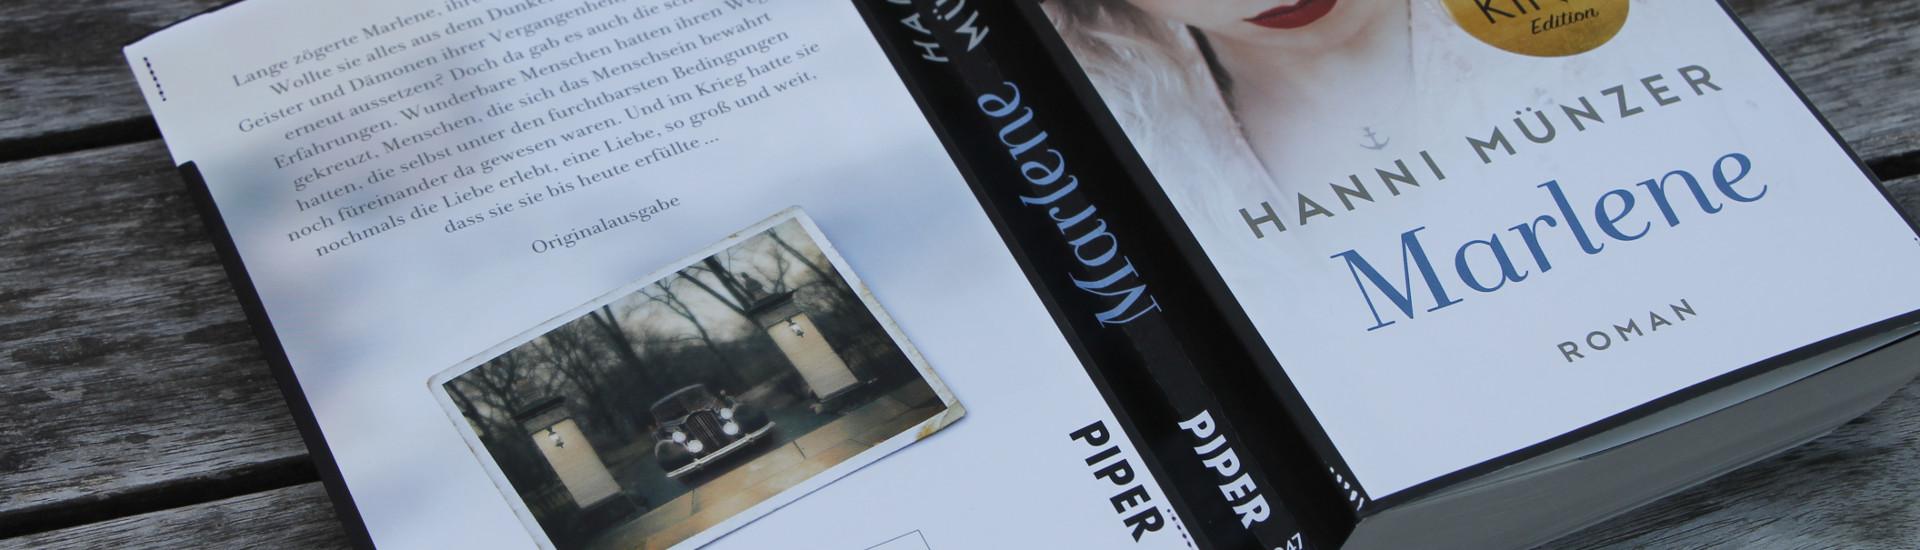 Hanni Münzer Piper Verlag Lavendelblog